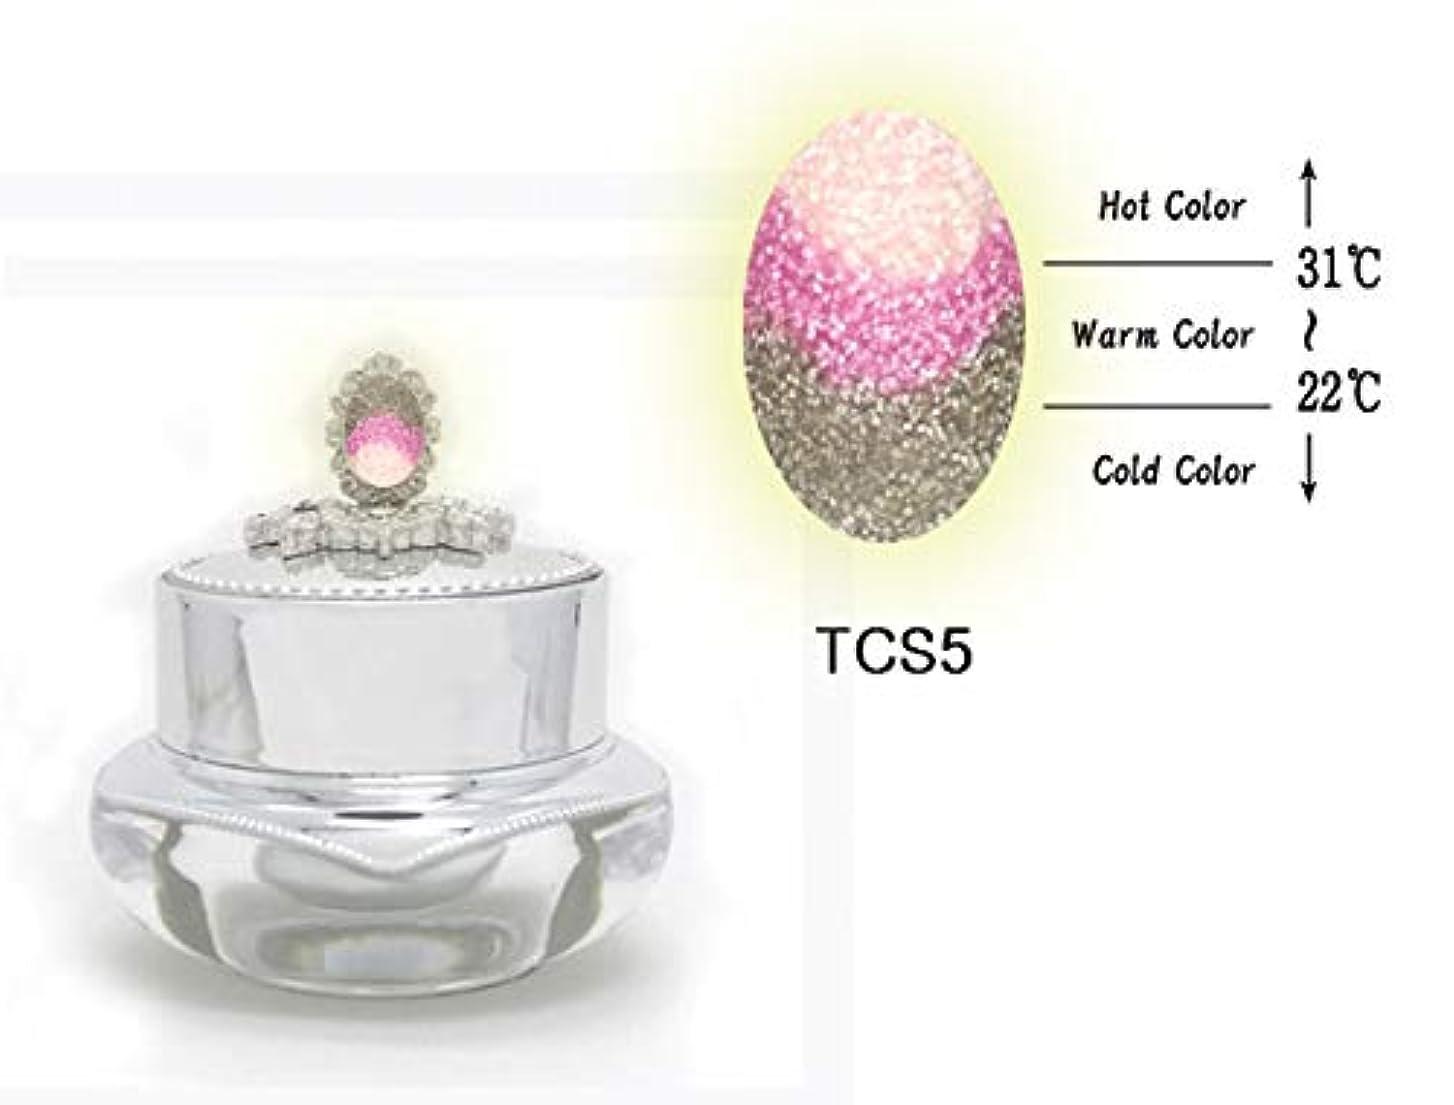 KENZICO (ケンジコ) Triple Sugar Gel プロ用5g 【TCS5】 3つの色に変わる夜光ジェル トリプルシュガージェル